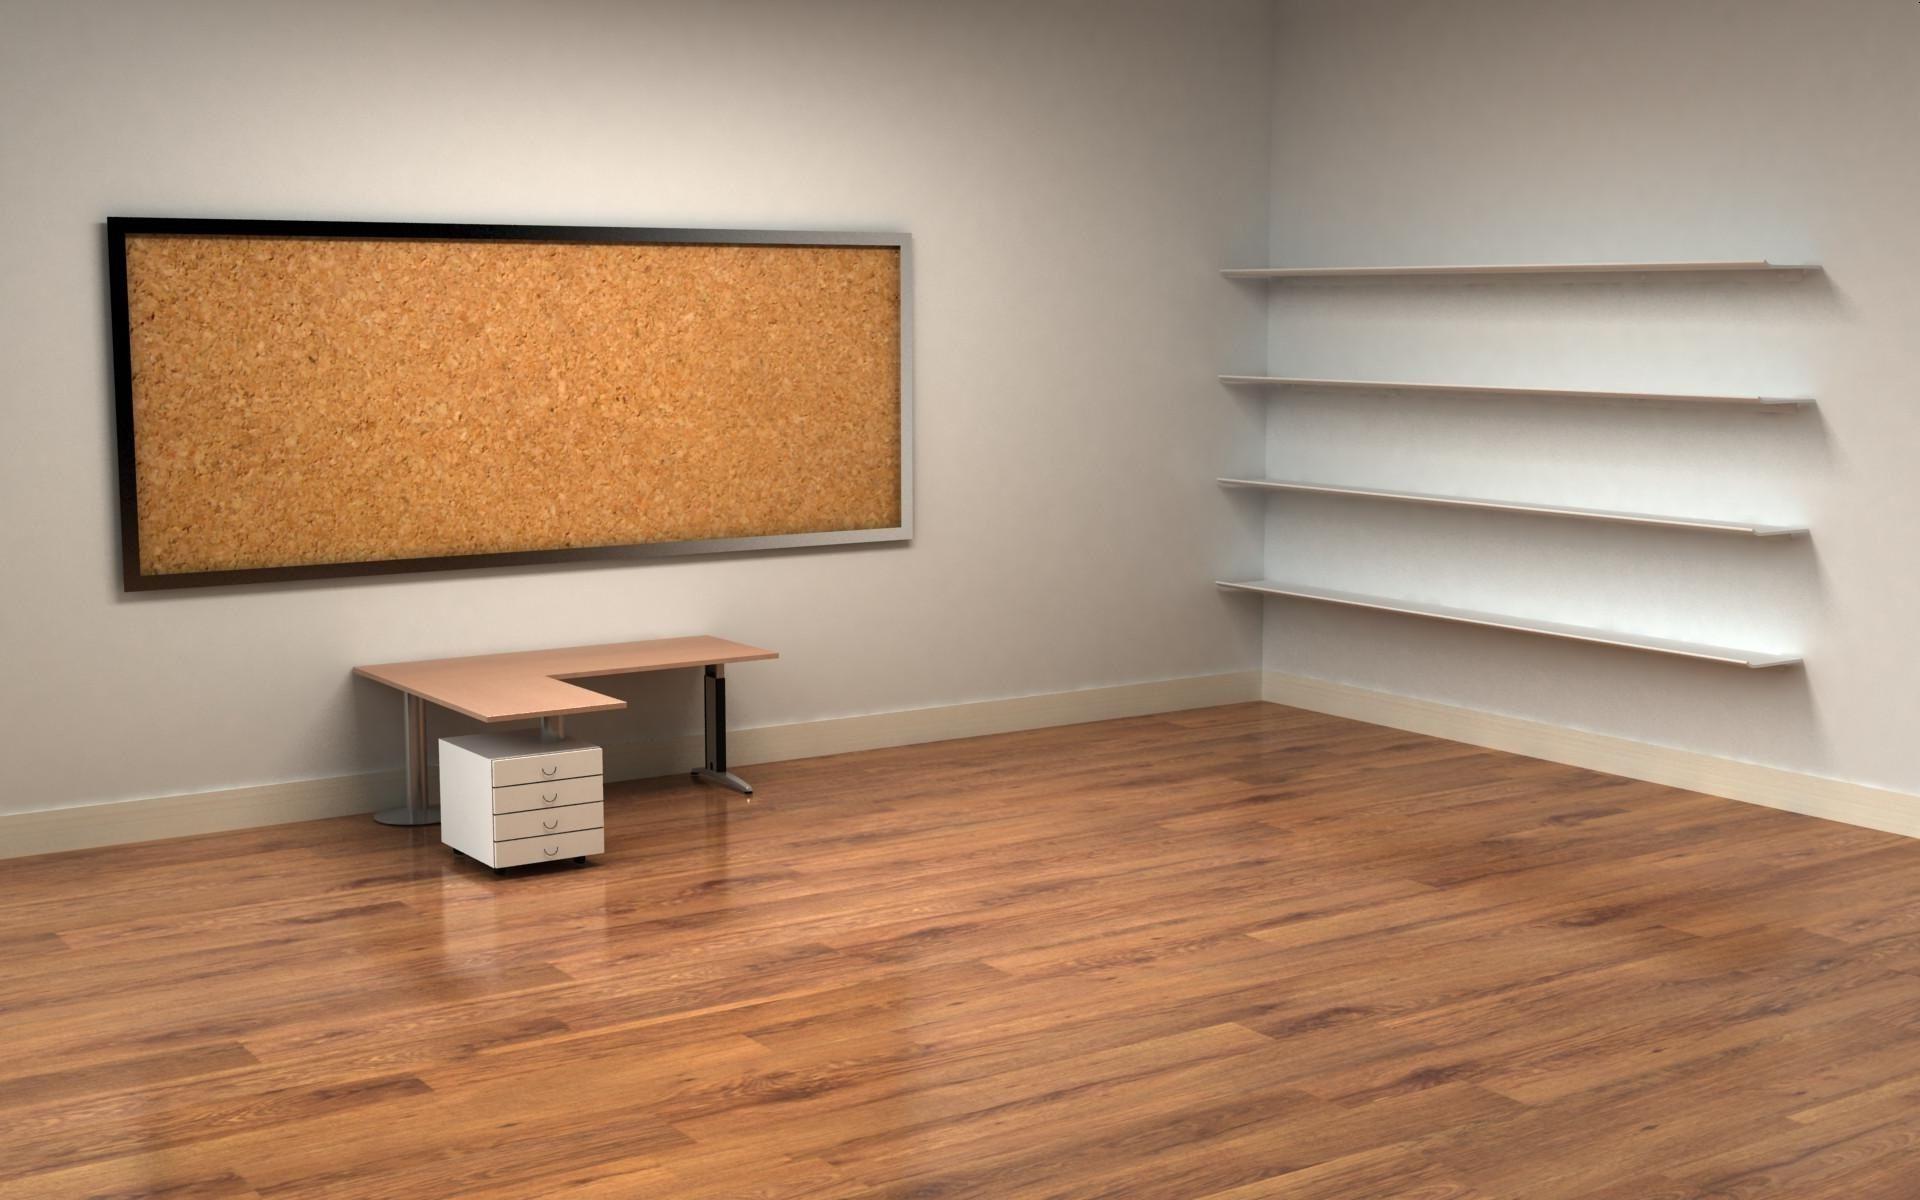 Office interior desks interior designs 1920x1200 for Wallpaper for interior walls